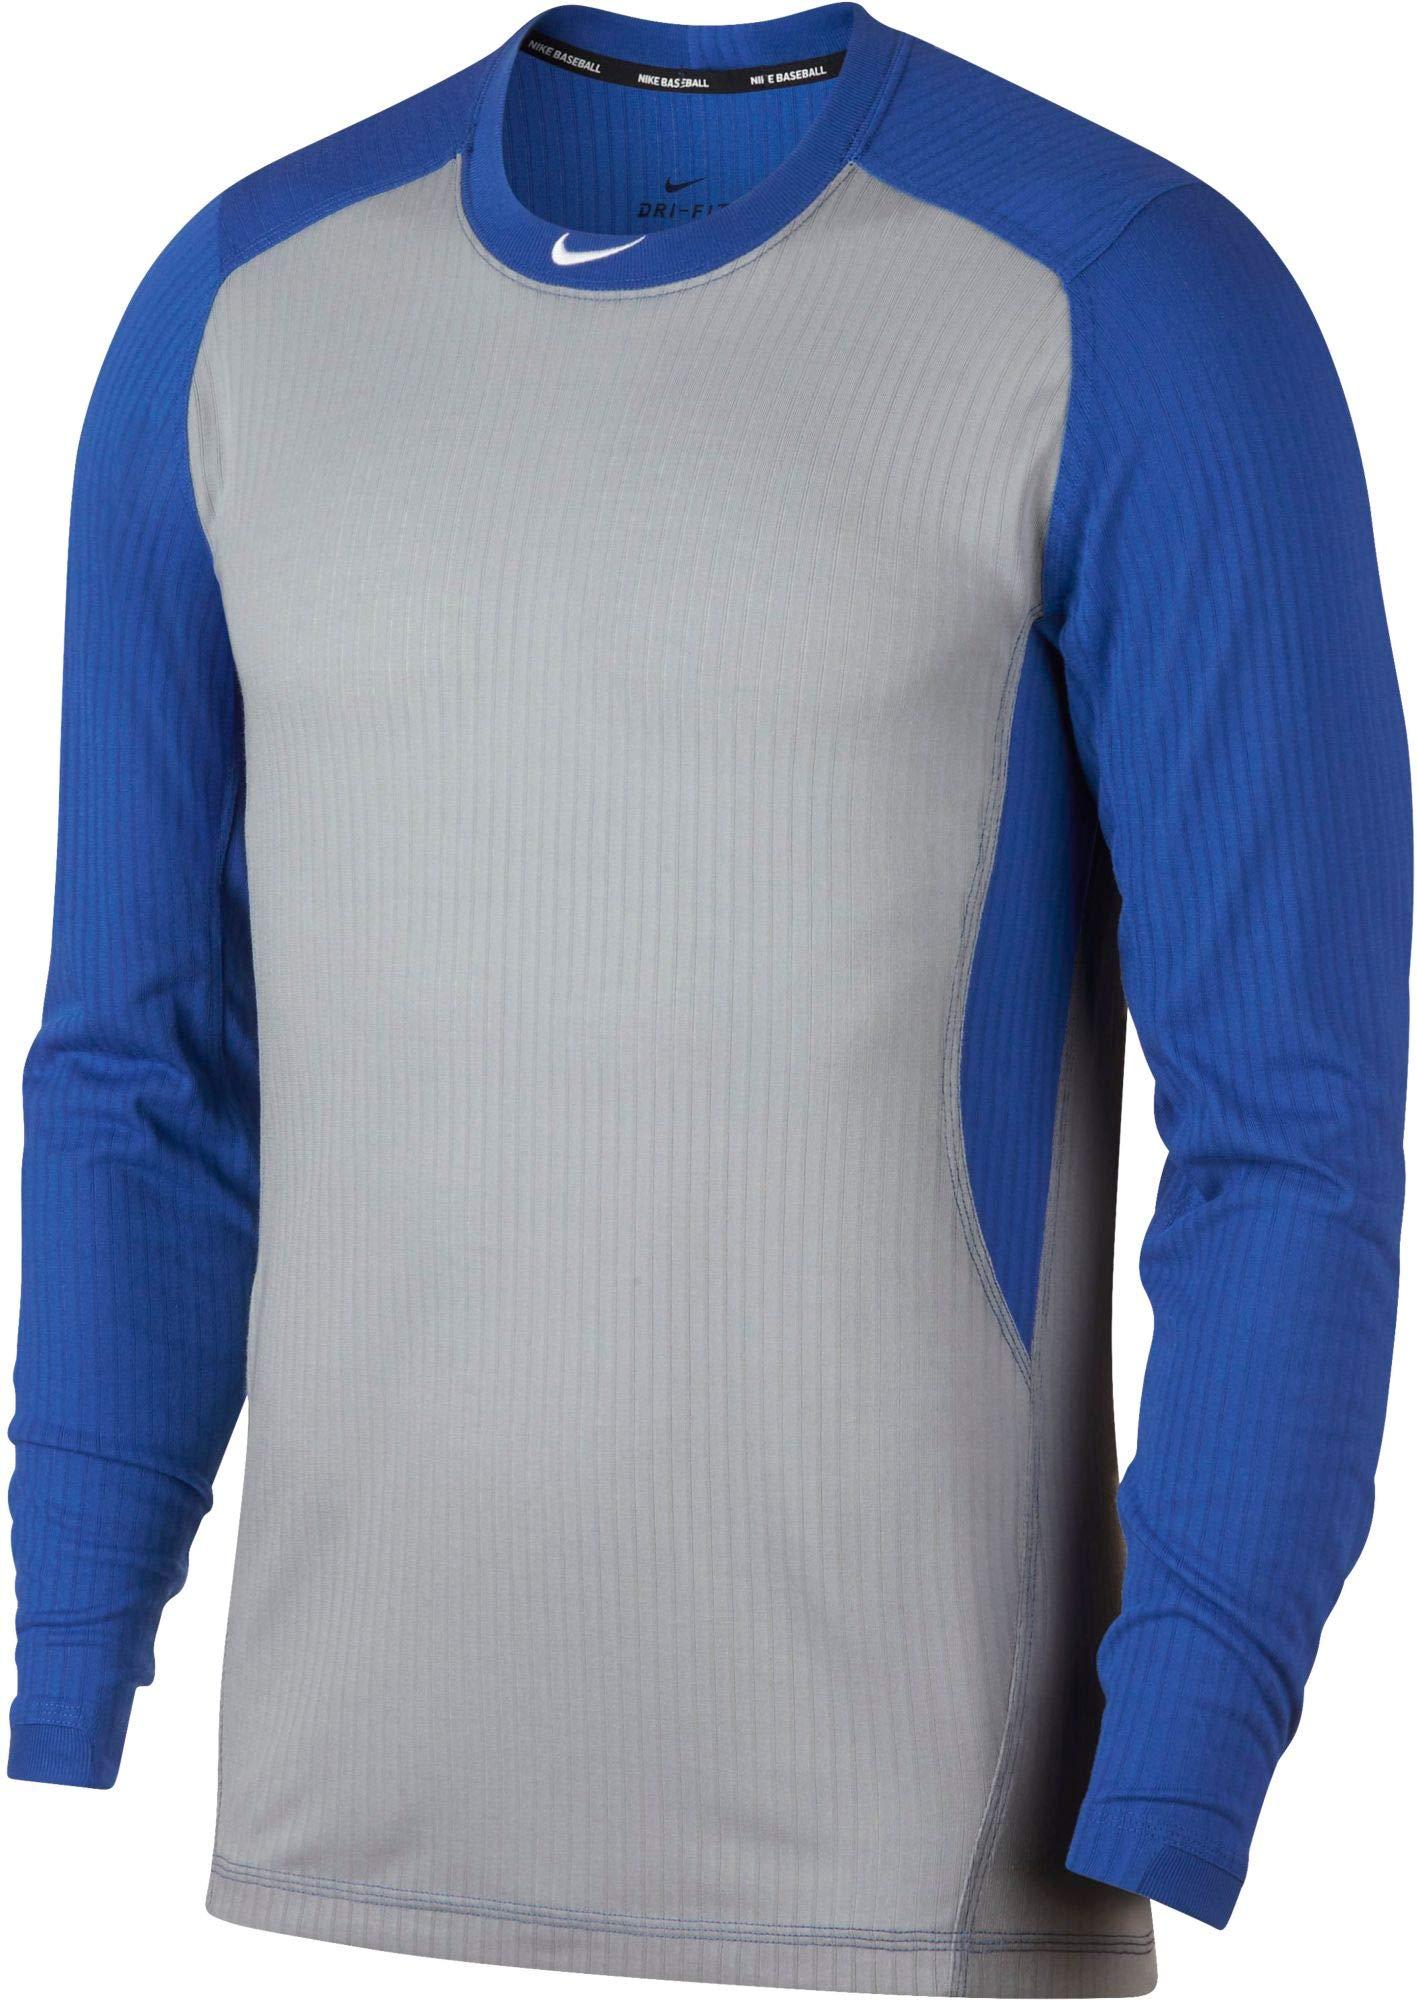 Nike Men's Long-Sleeve Baseball Top (Wolf Grey/Game Royal, Medium)